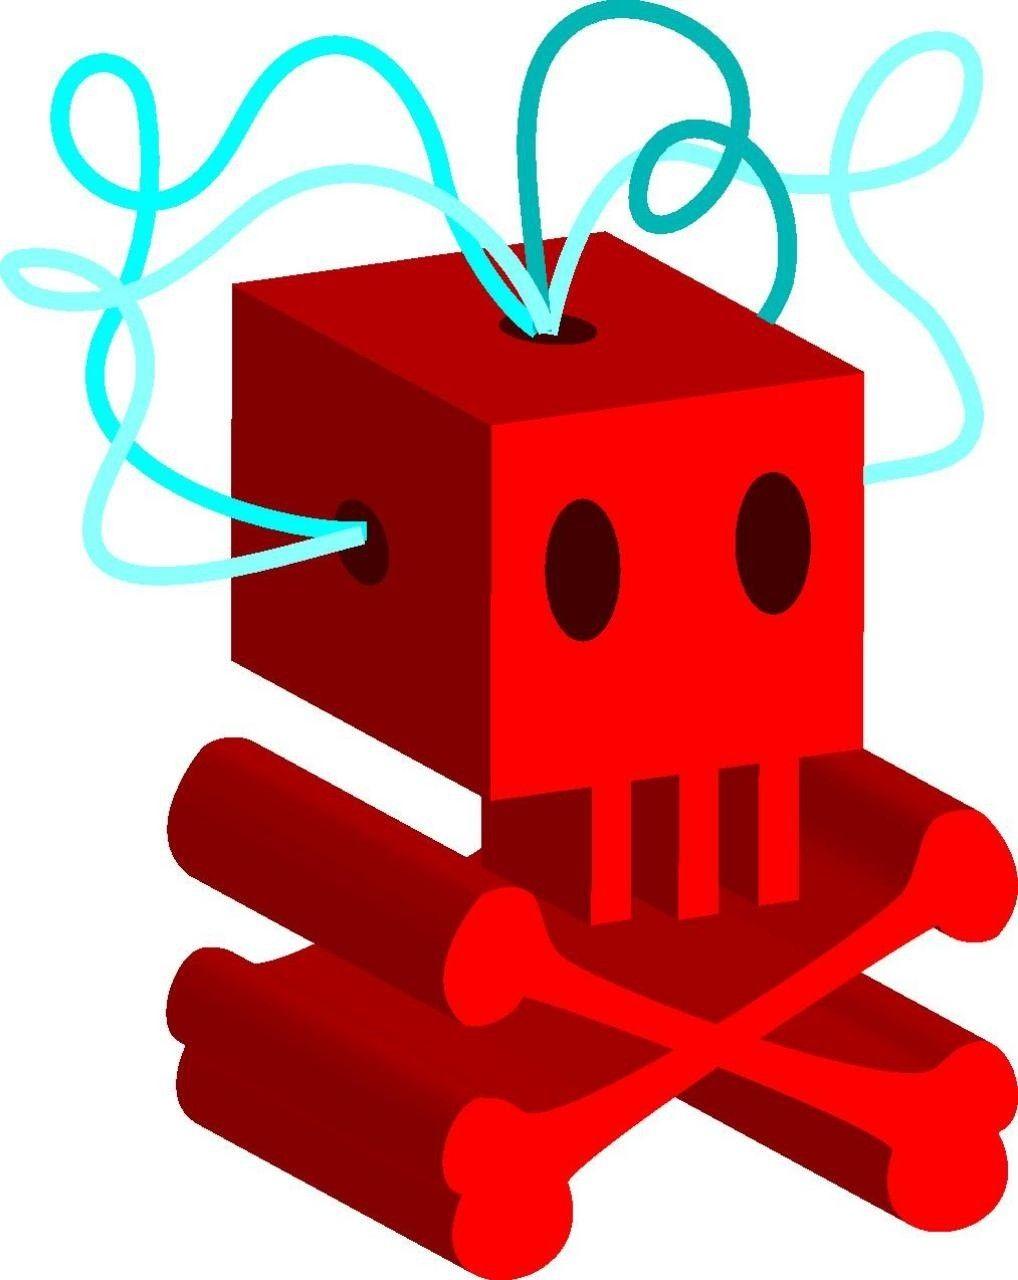 CO-HM-2012-003-0016-01-GR